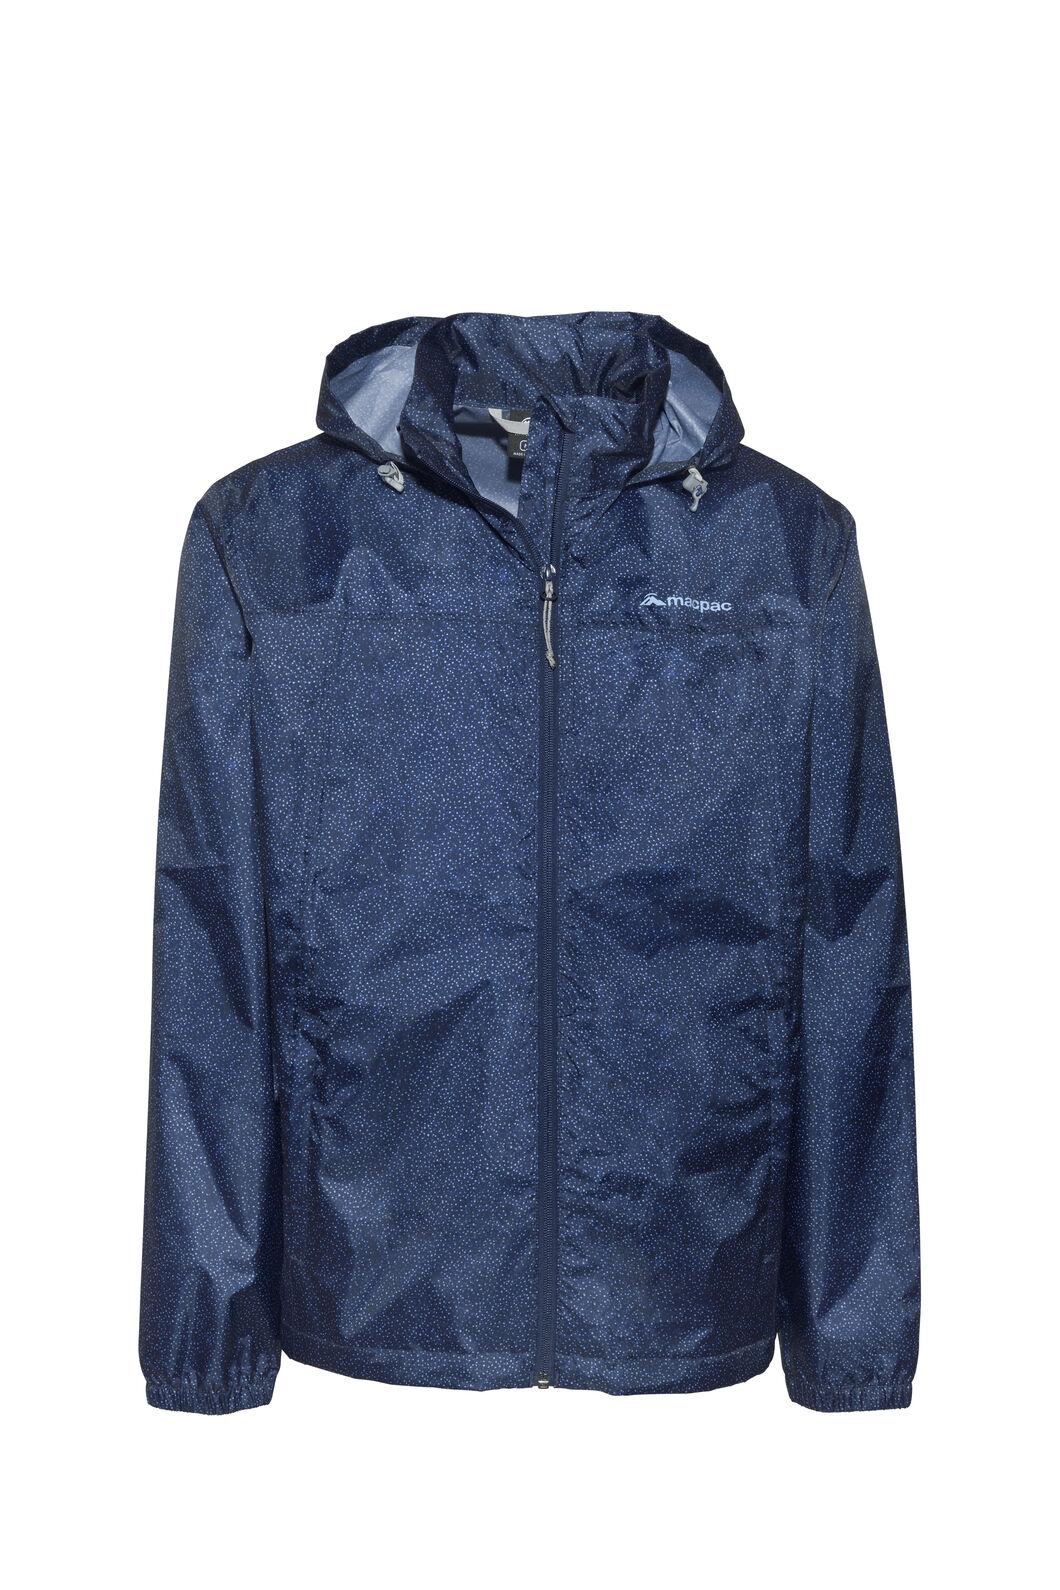 Macpac Pack-It-Jacket — Unisex, Blueprint Speckle Print, hi-res